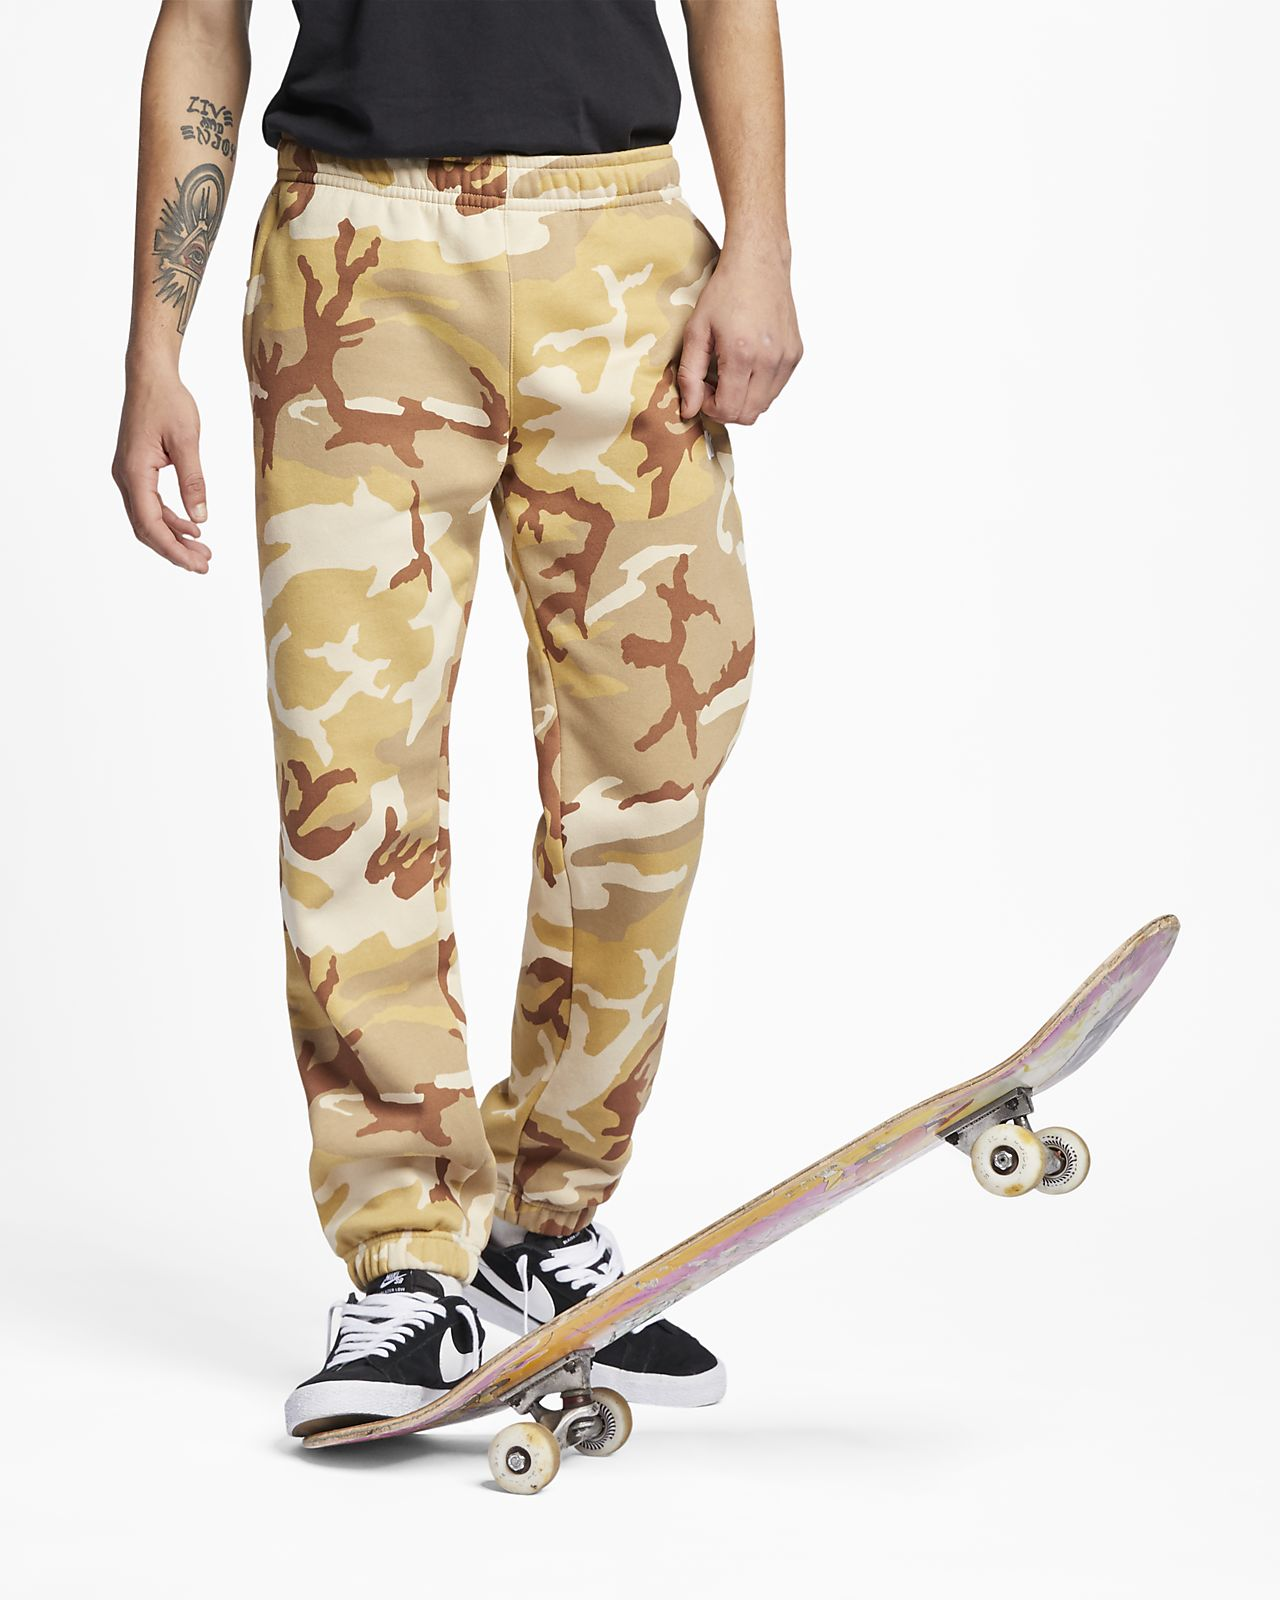 Pantalon de skateboard camouflage Nike SB Icon pour Homme